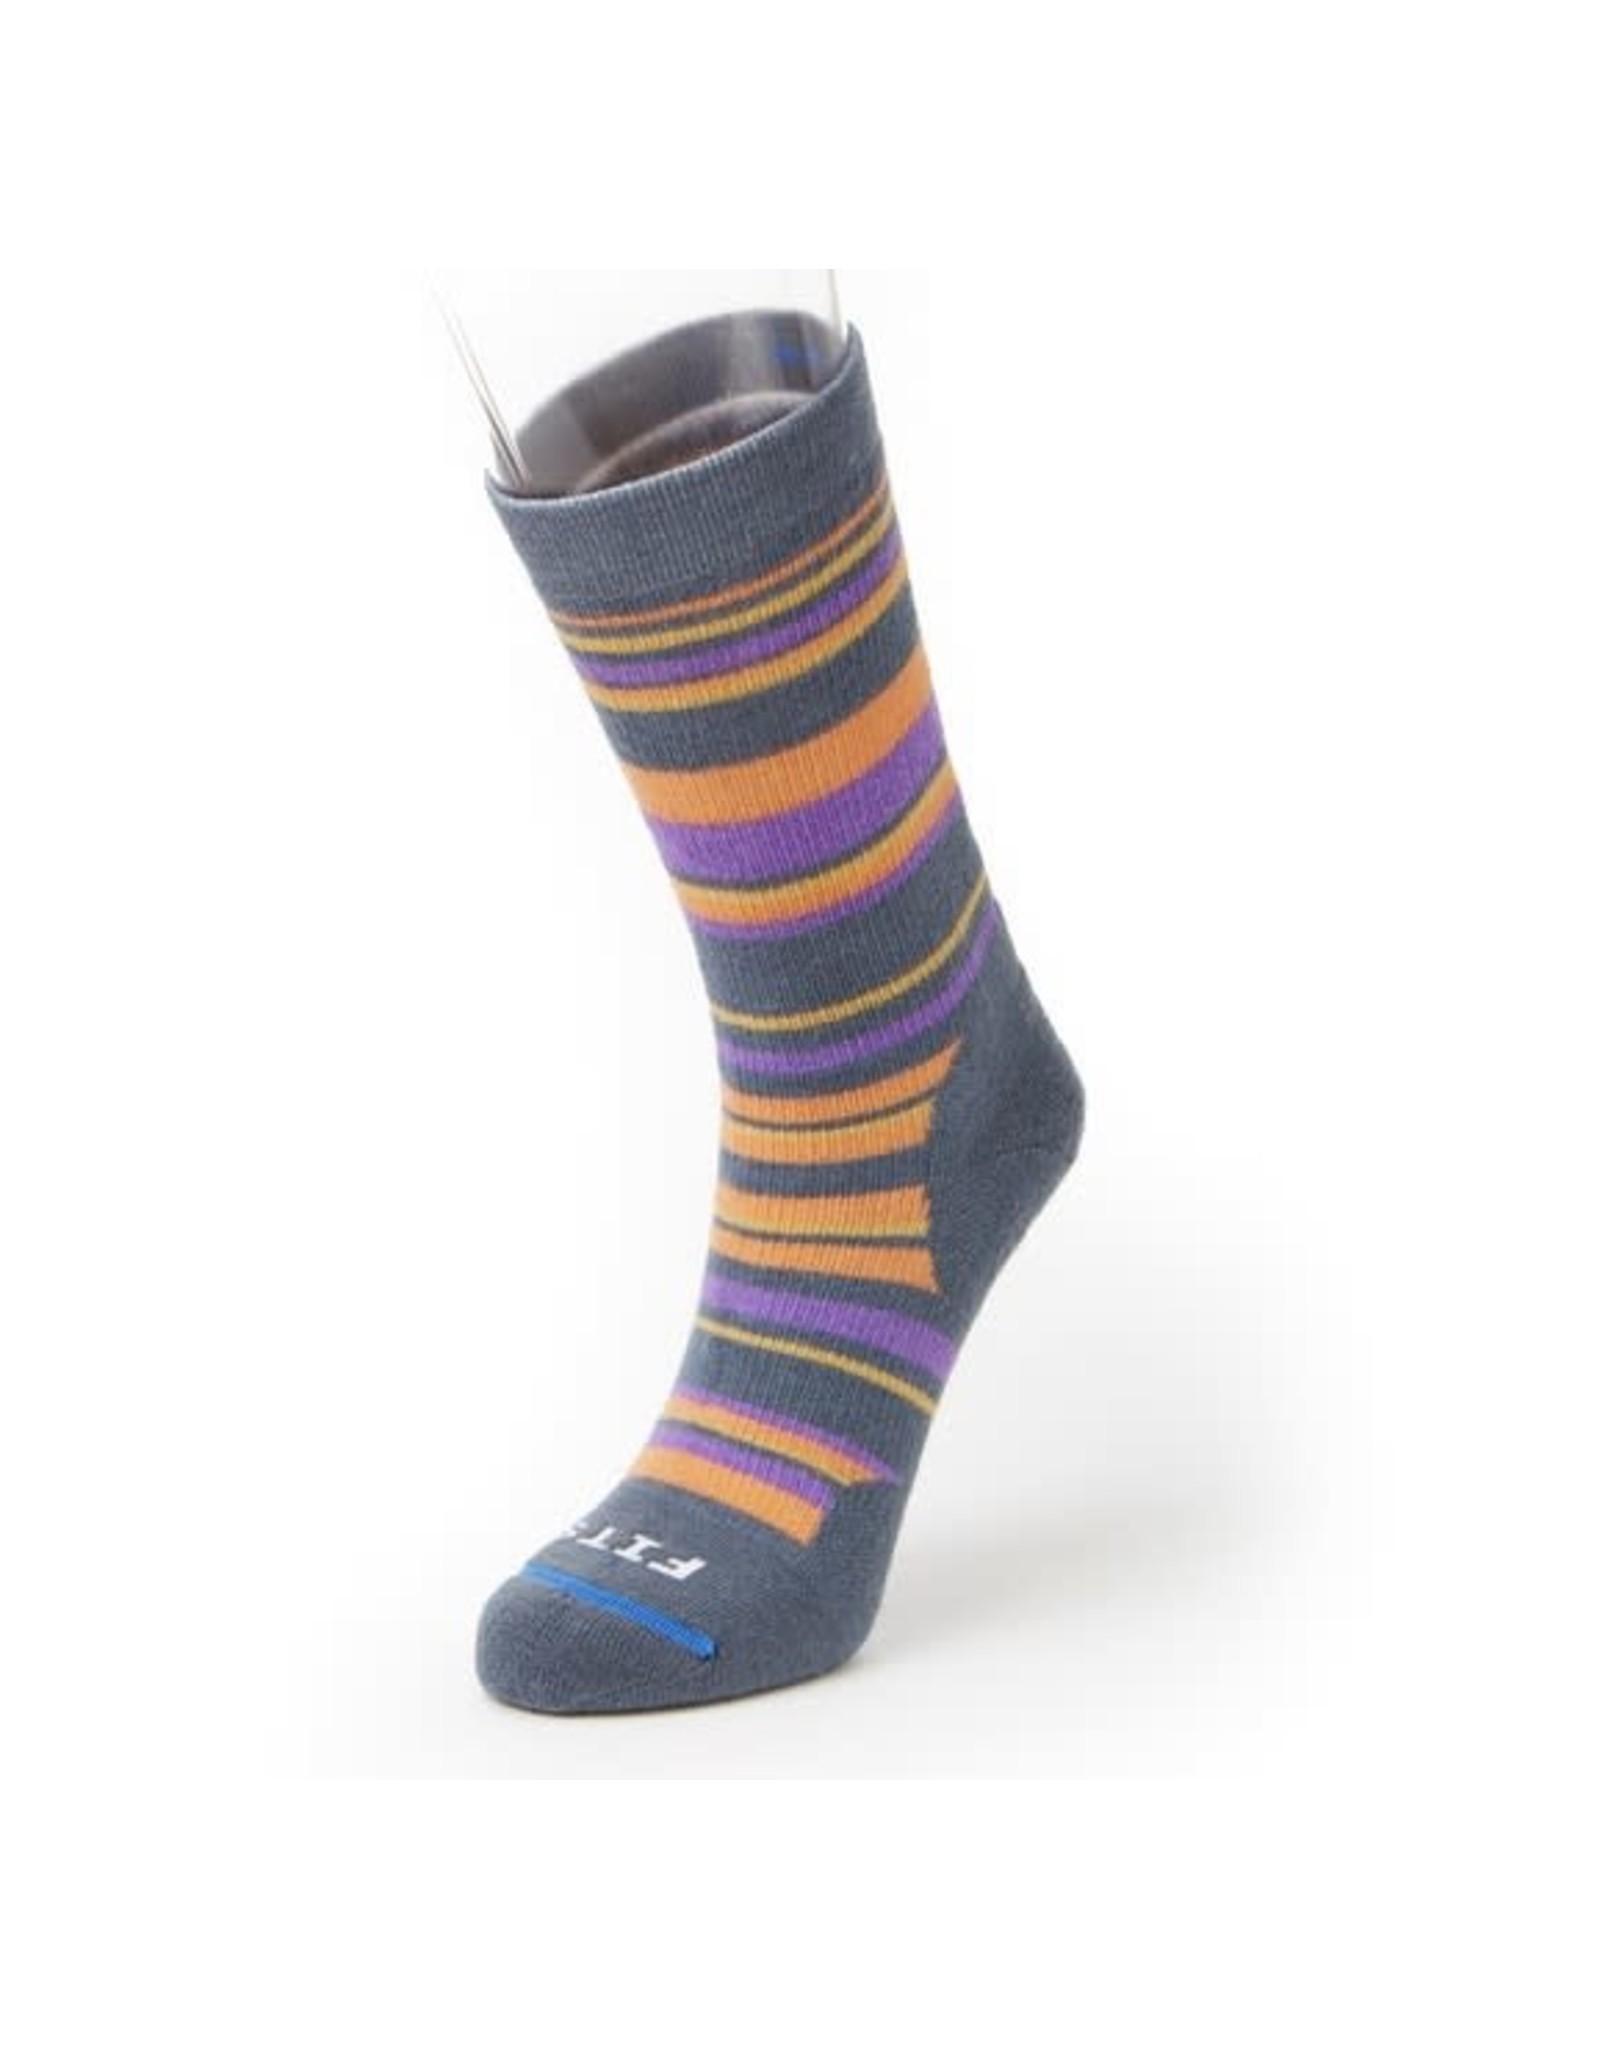 FITS Socks Medium Hiker Mens Crew